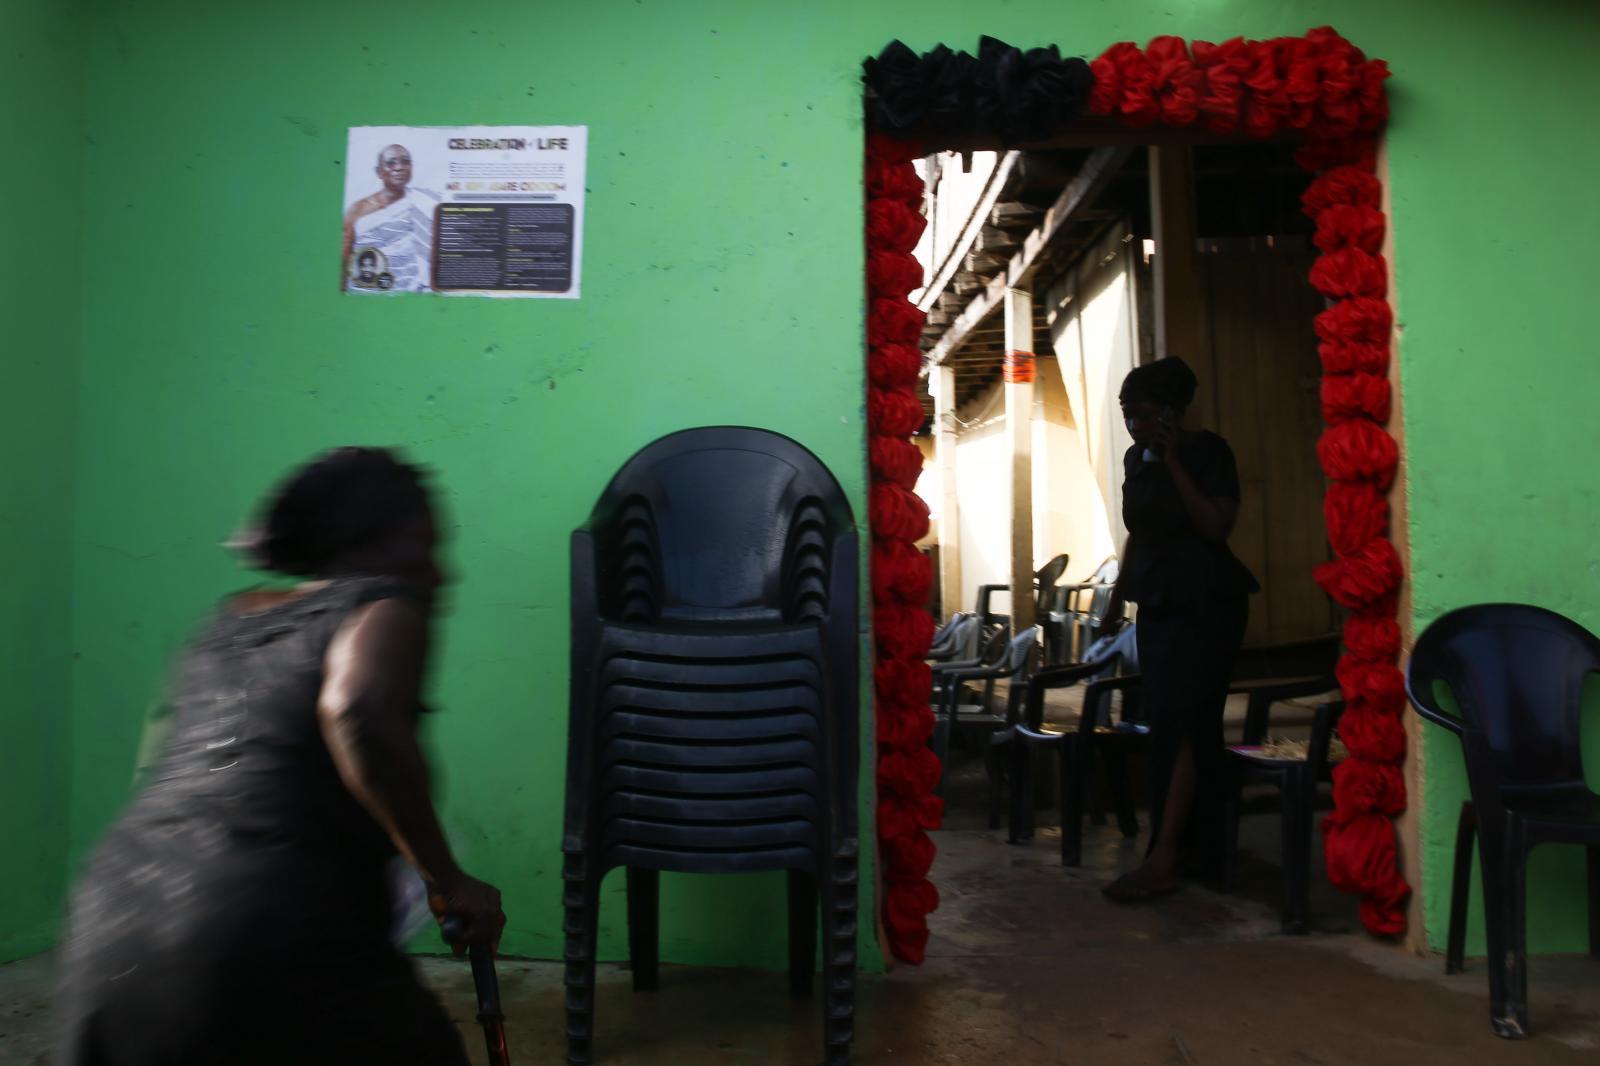 Photography image - Loading INTERMENT-NIPAH-DENNIS-GHANA-02.jpg